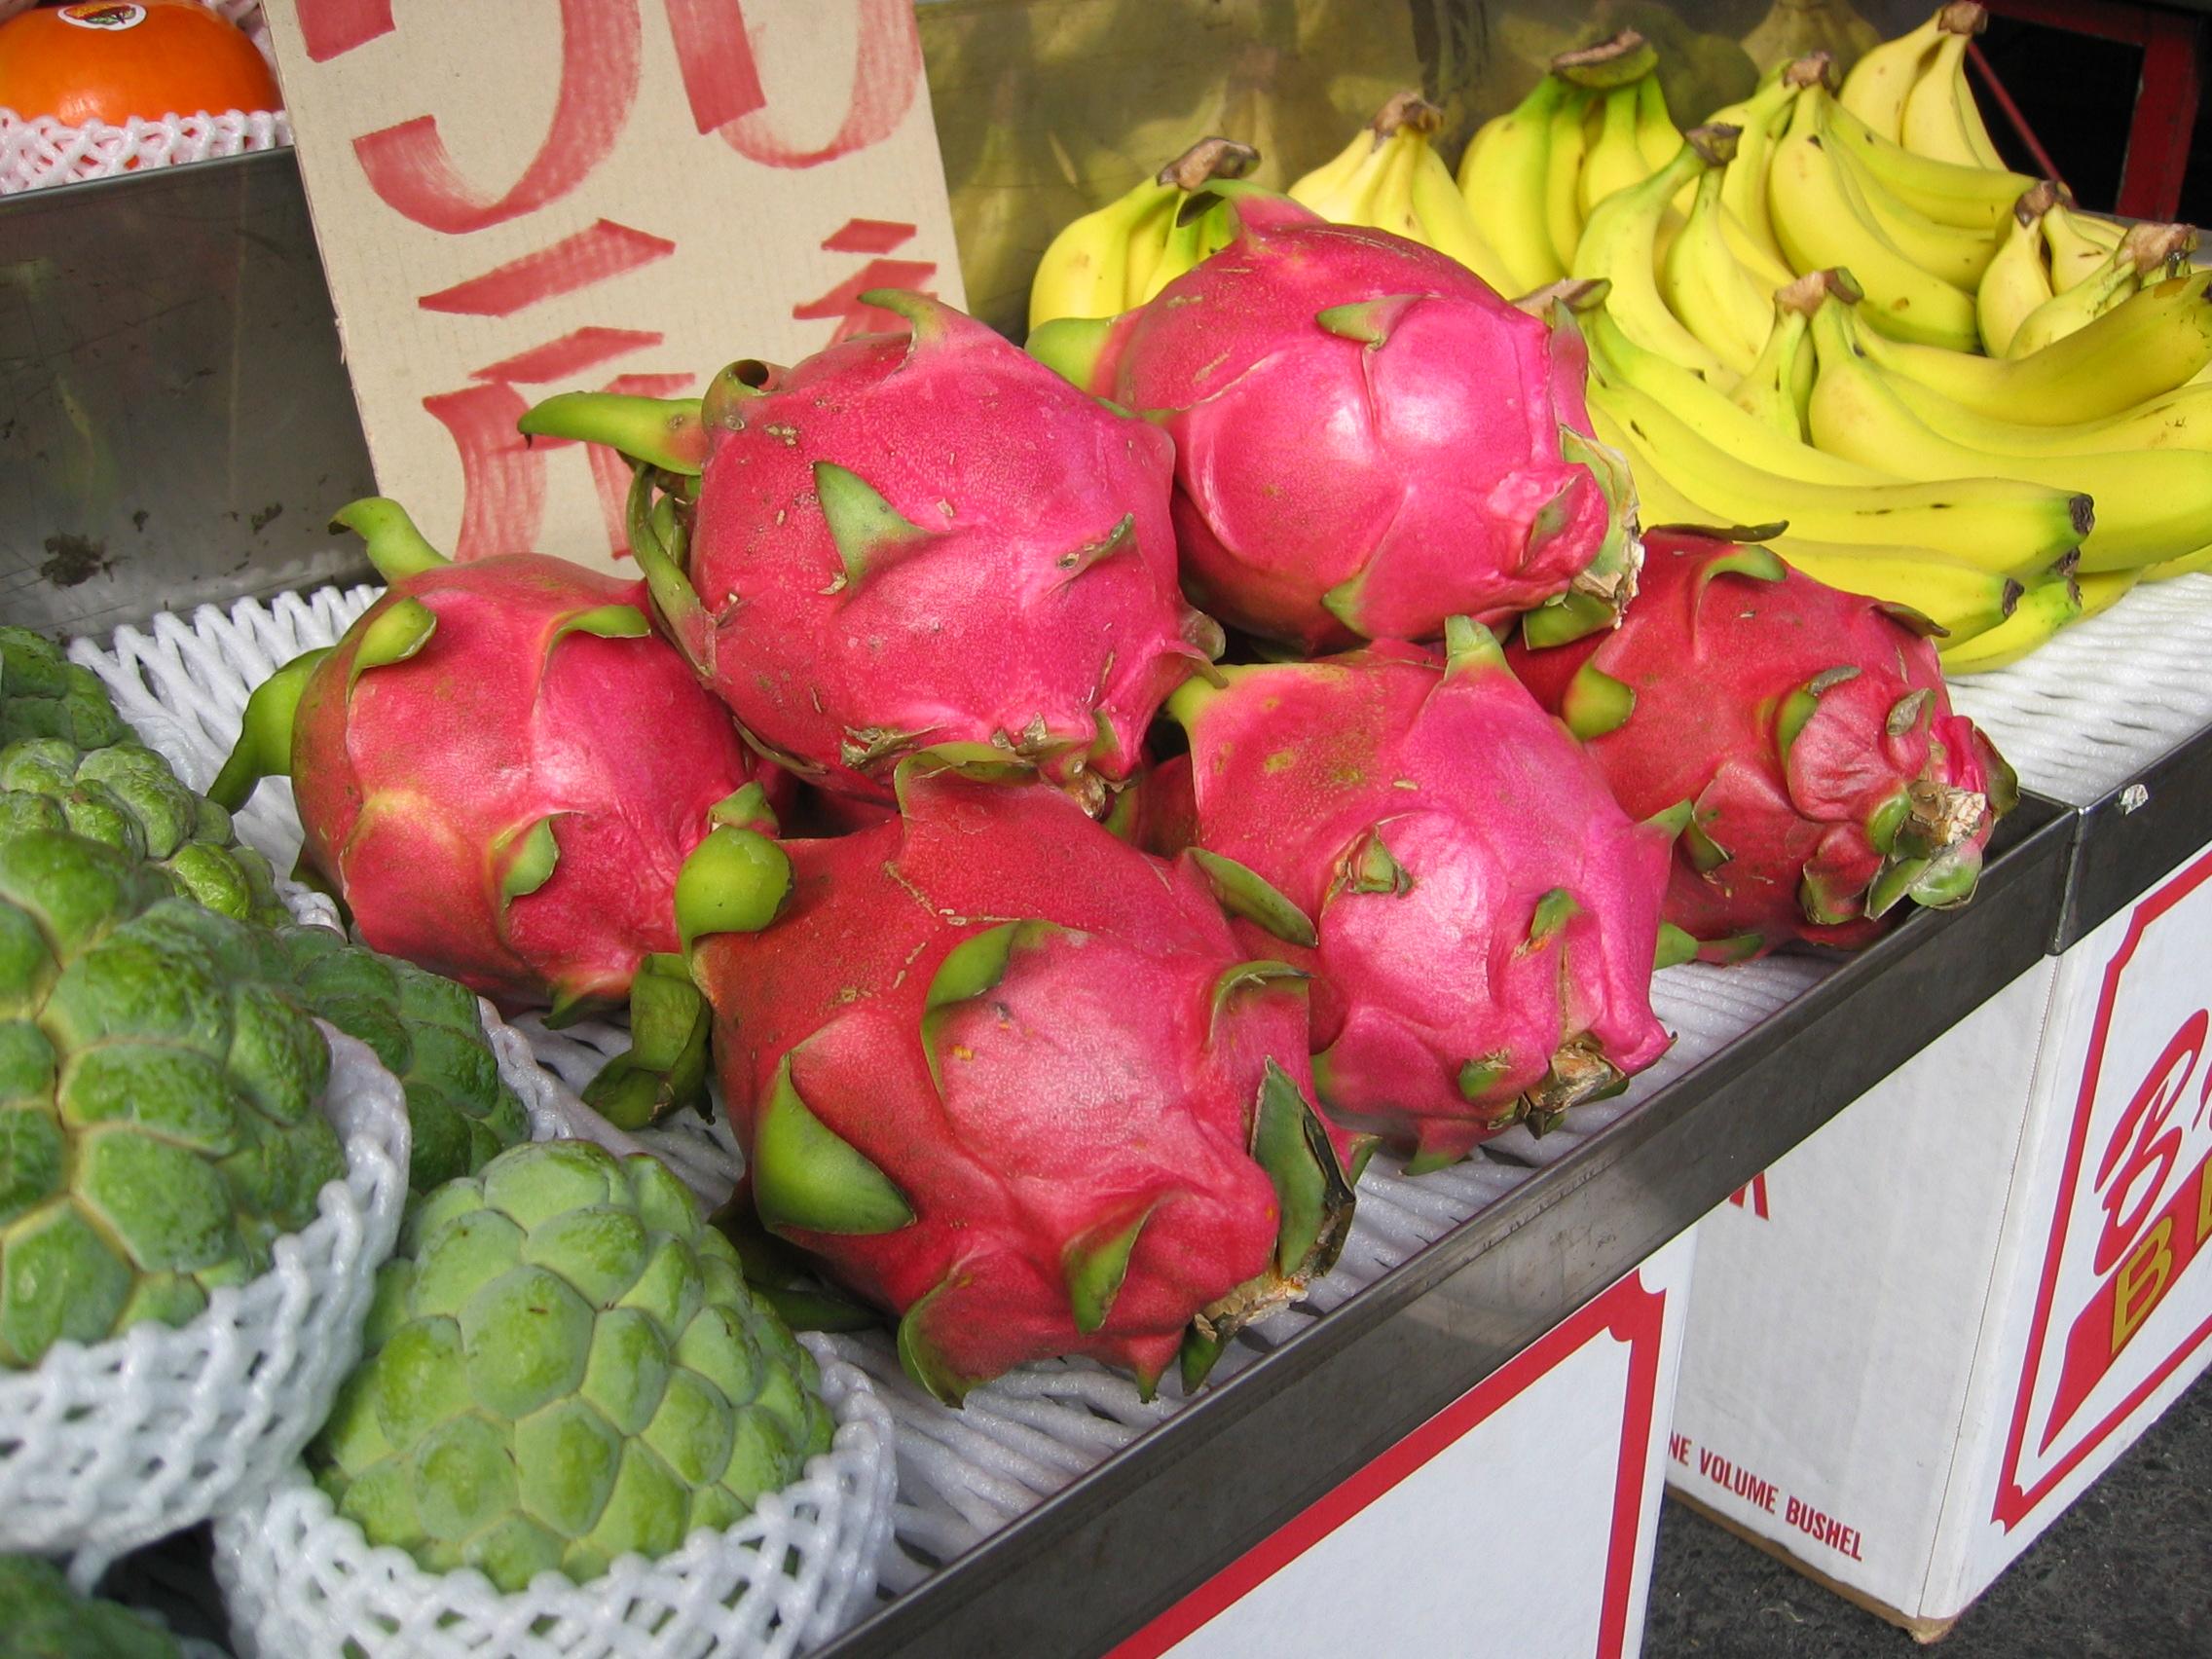 http://upload.wikimedia.org/wikipedia/commons/9/9f/Dragonfruit_Chiayi_market.jpg